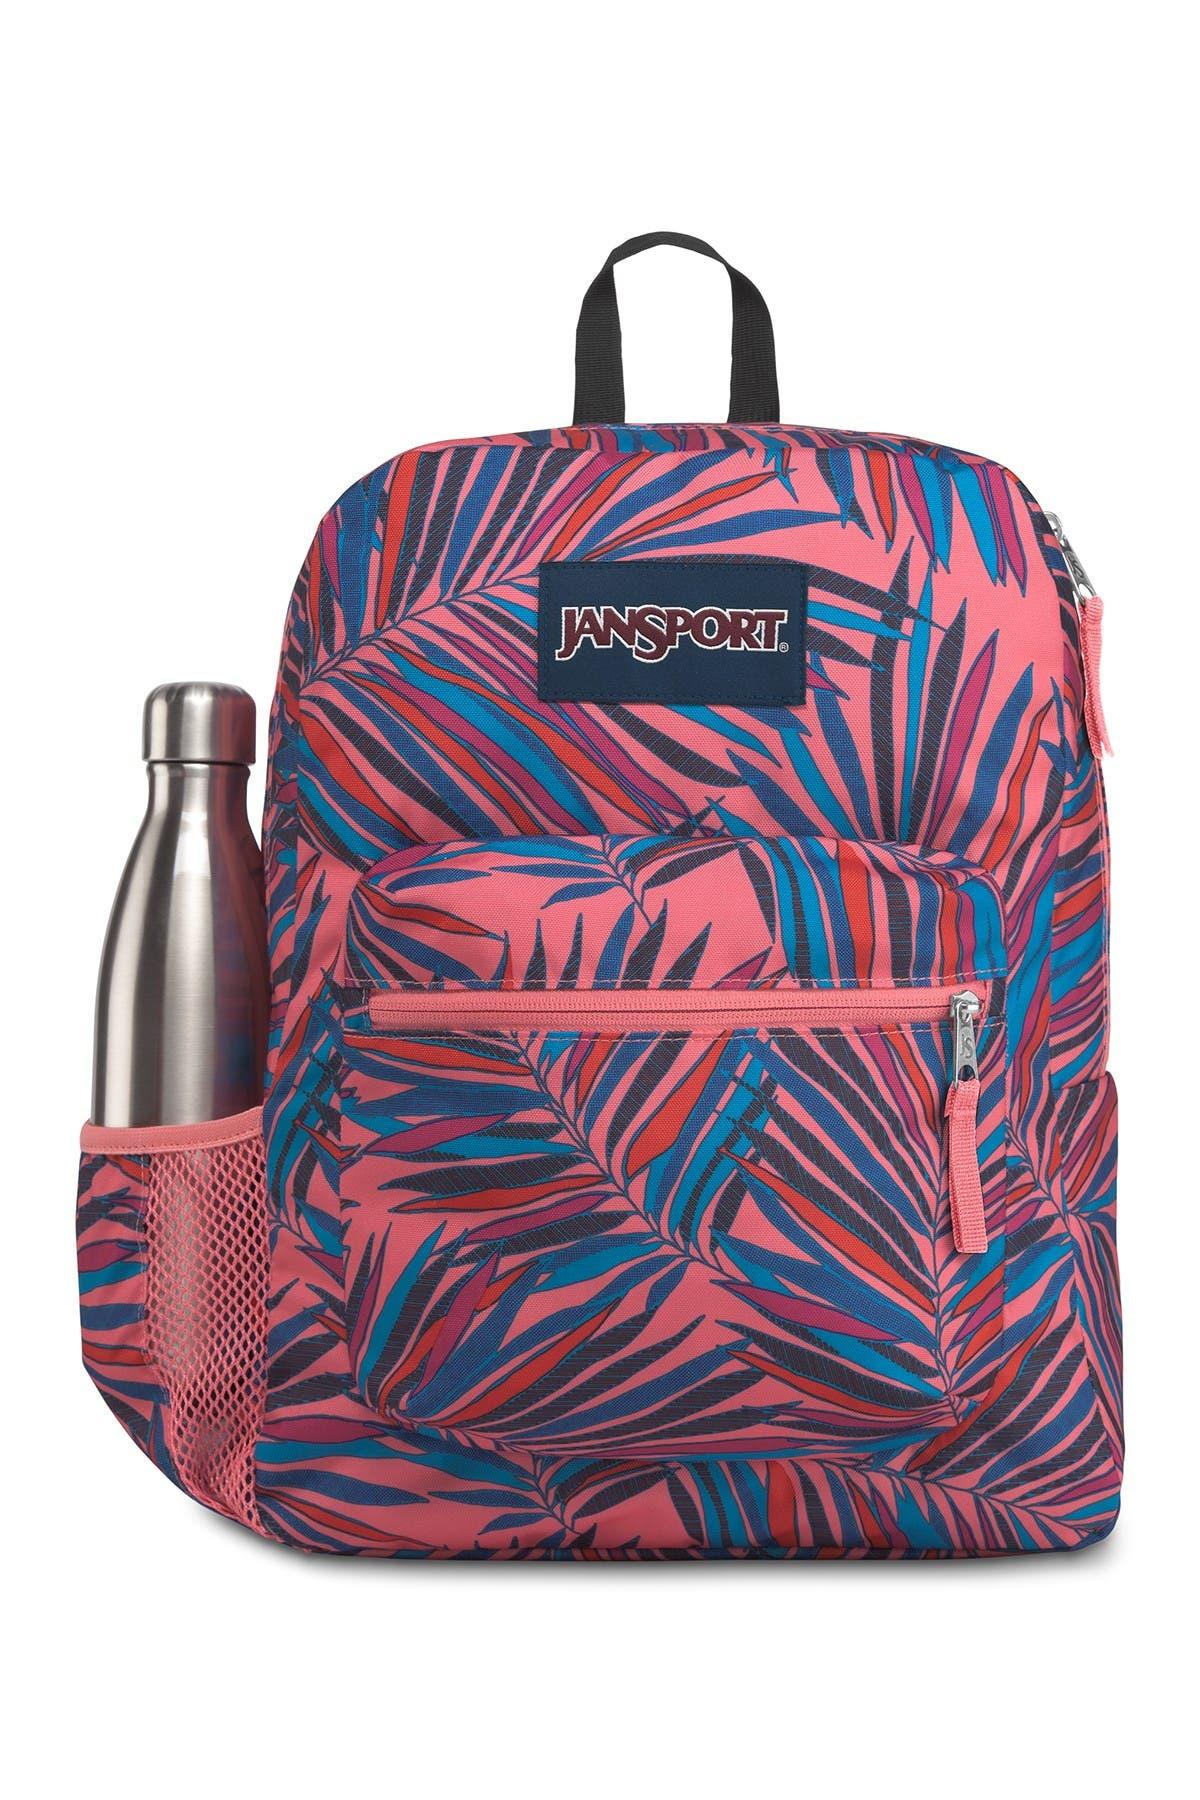 Image of JANSPORT Palm Leaf Print Cross Town Backpack